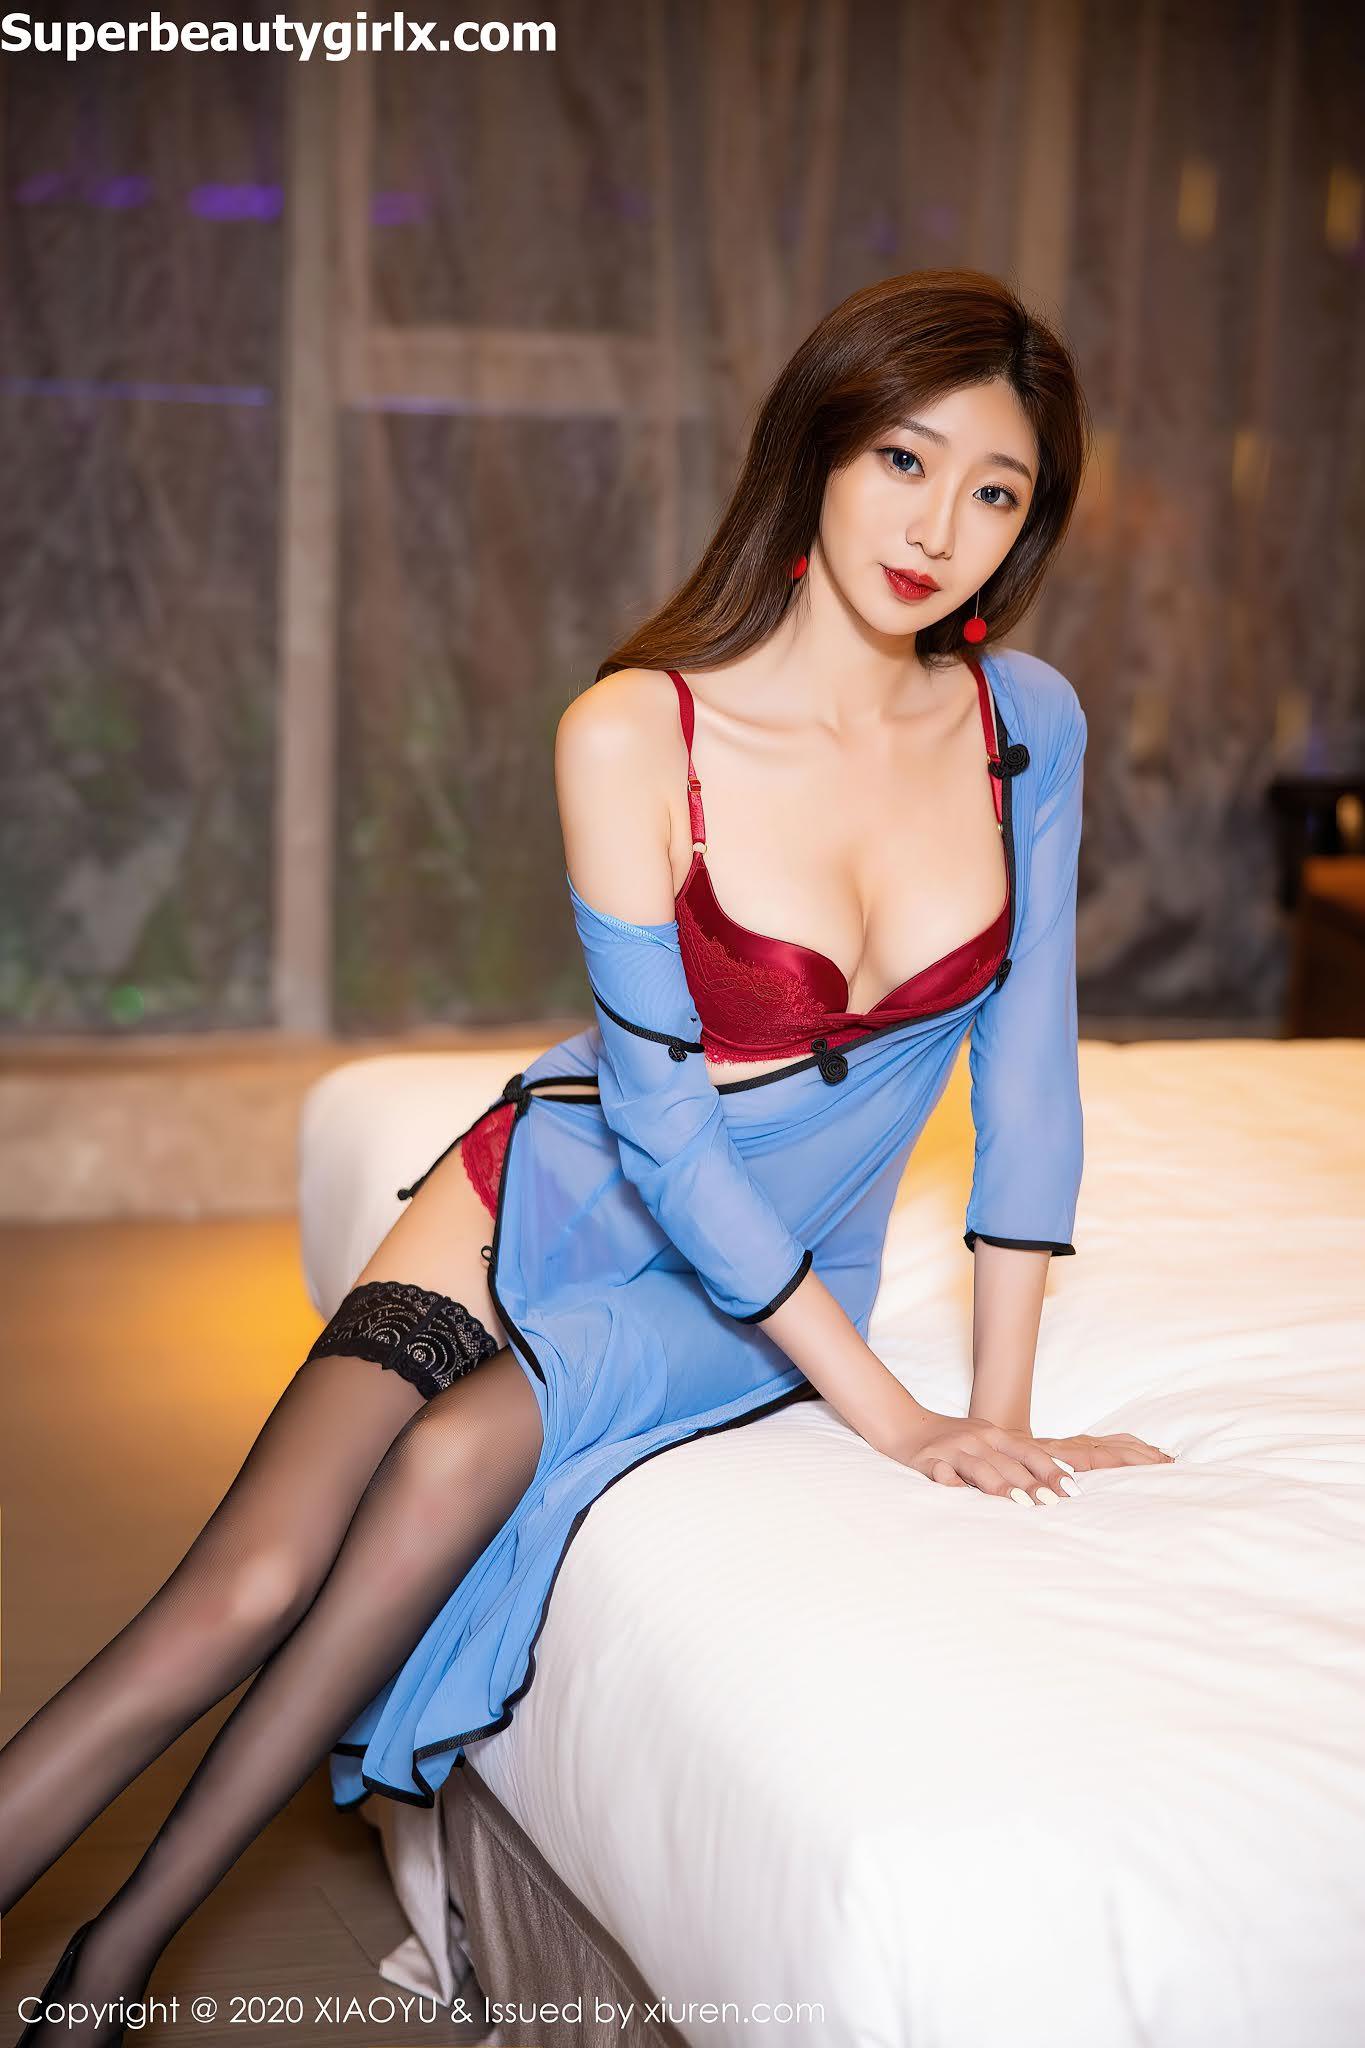 XiaoYu-Vol.412-Yee-Superbeautygirlx.com